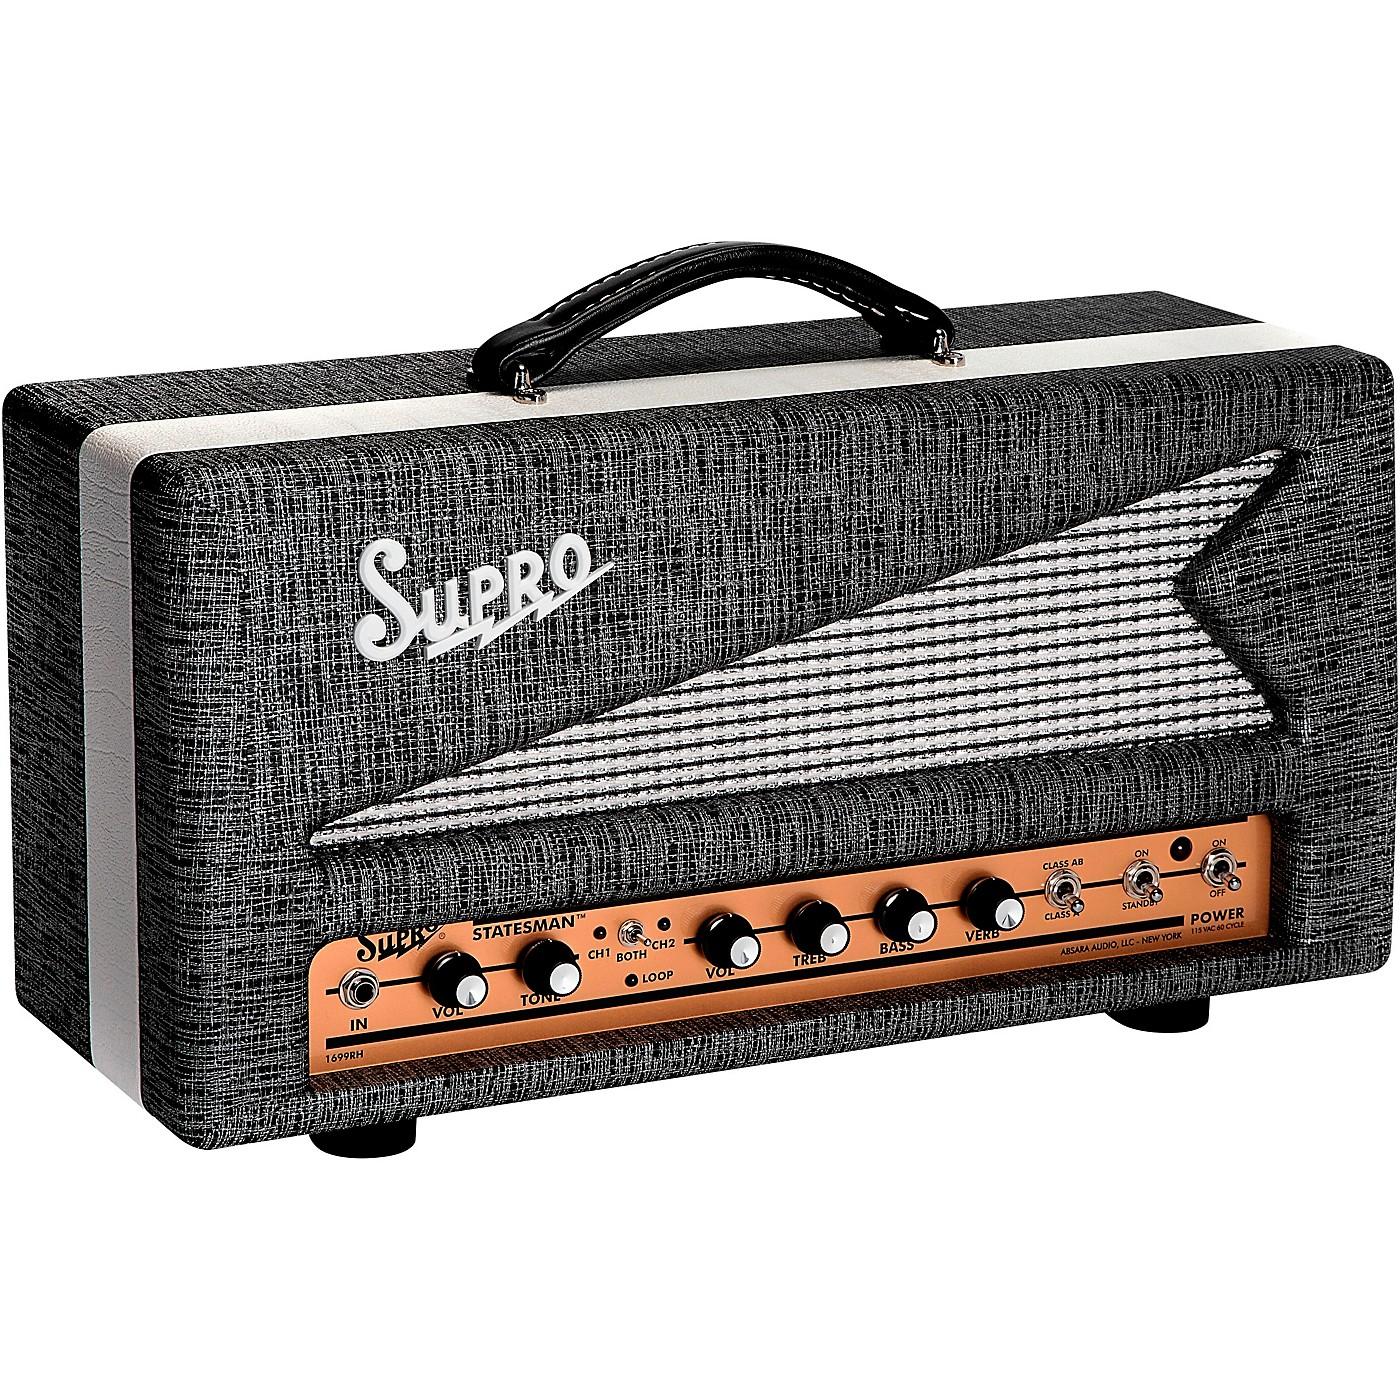 Supro 1699R Statesman 50W Tube Guitar Amp Head thumbnail